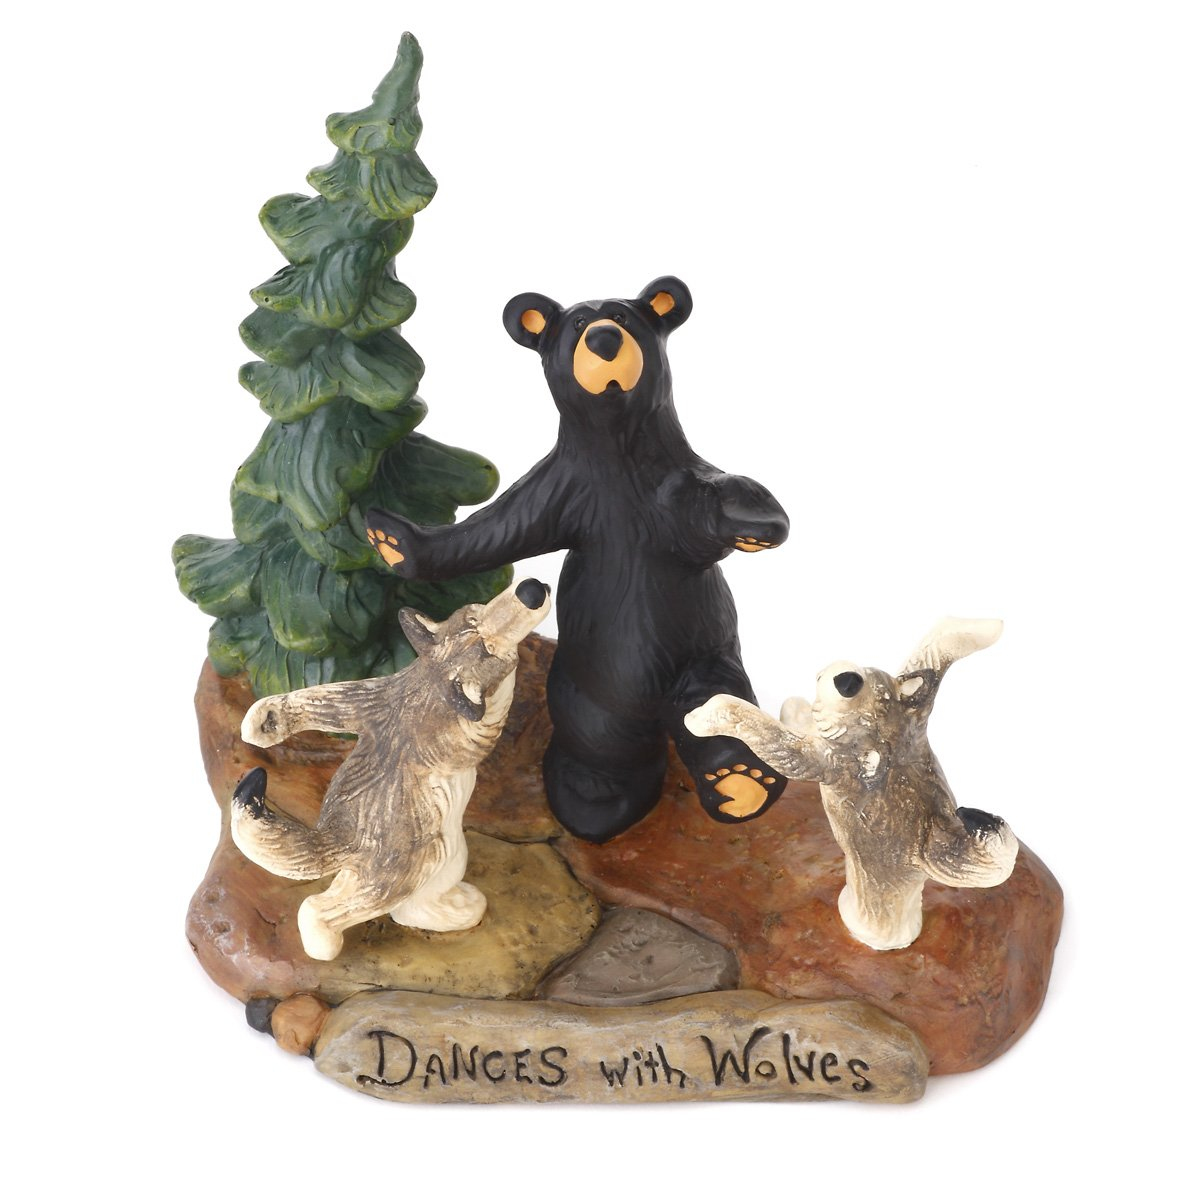 Big Sky Carvers Dances with Wolves Figurine